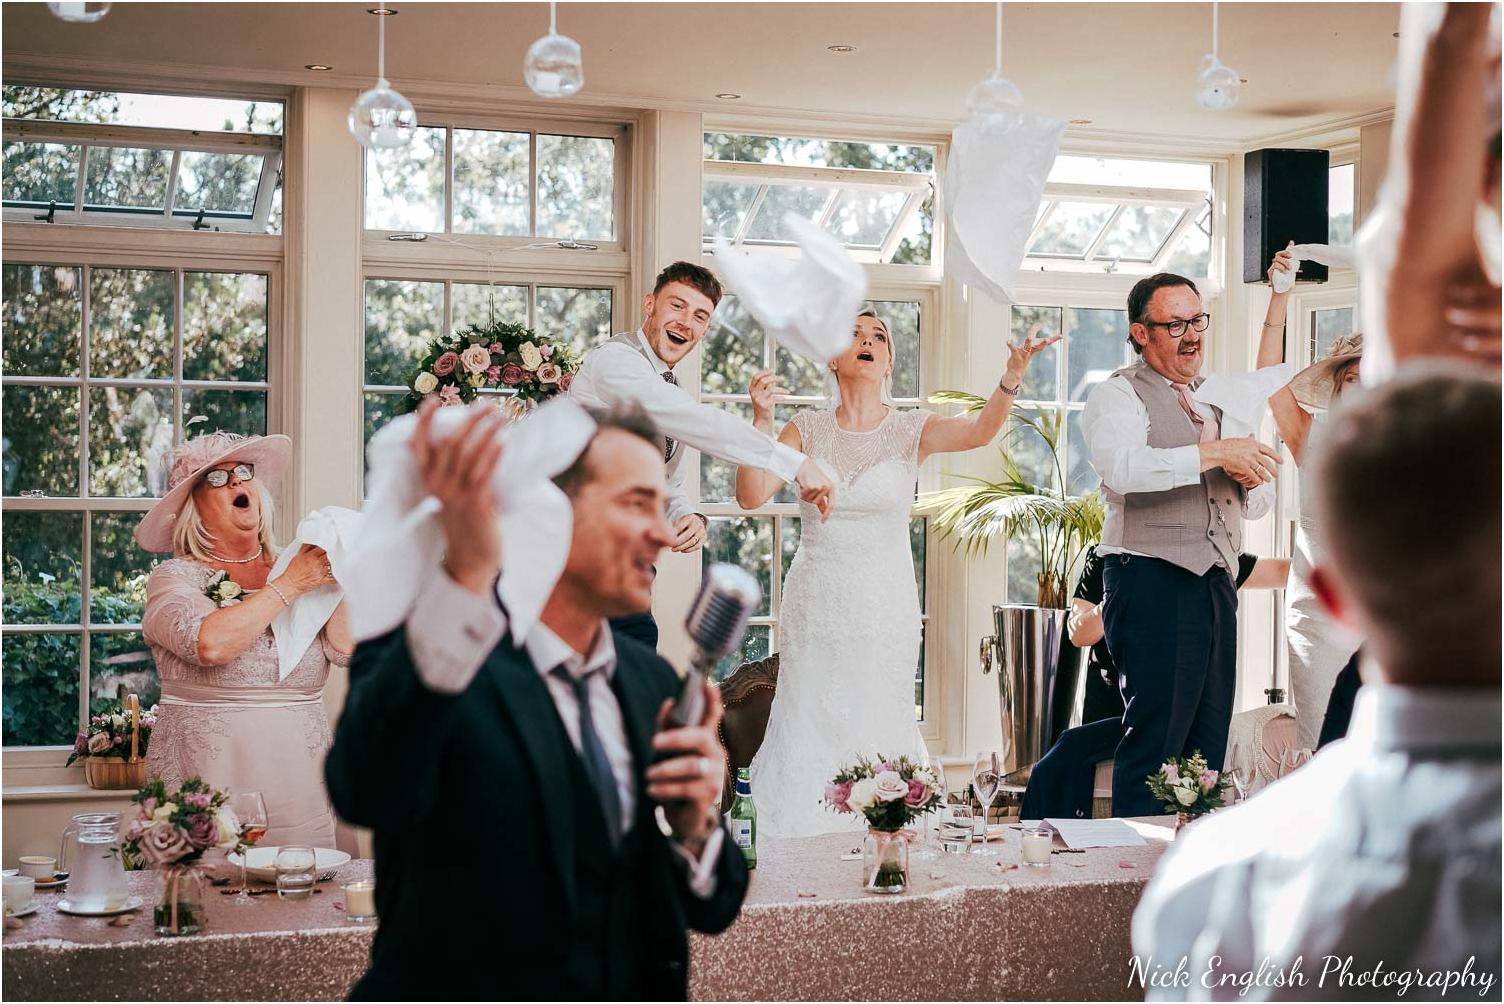 Mitton_Hall_Wedding_Photograph-133.jpg